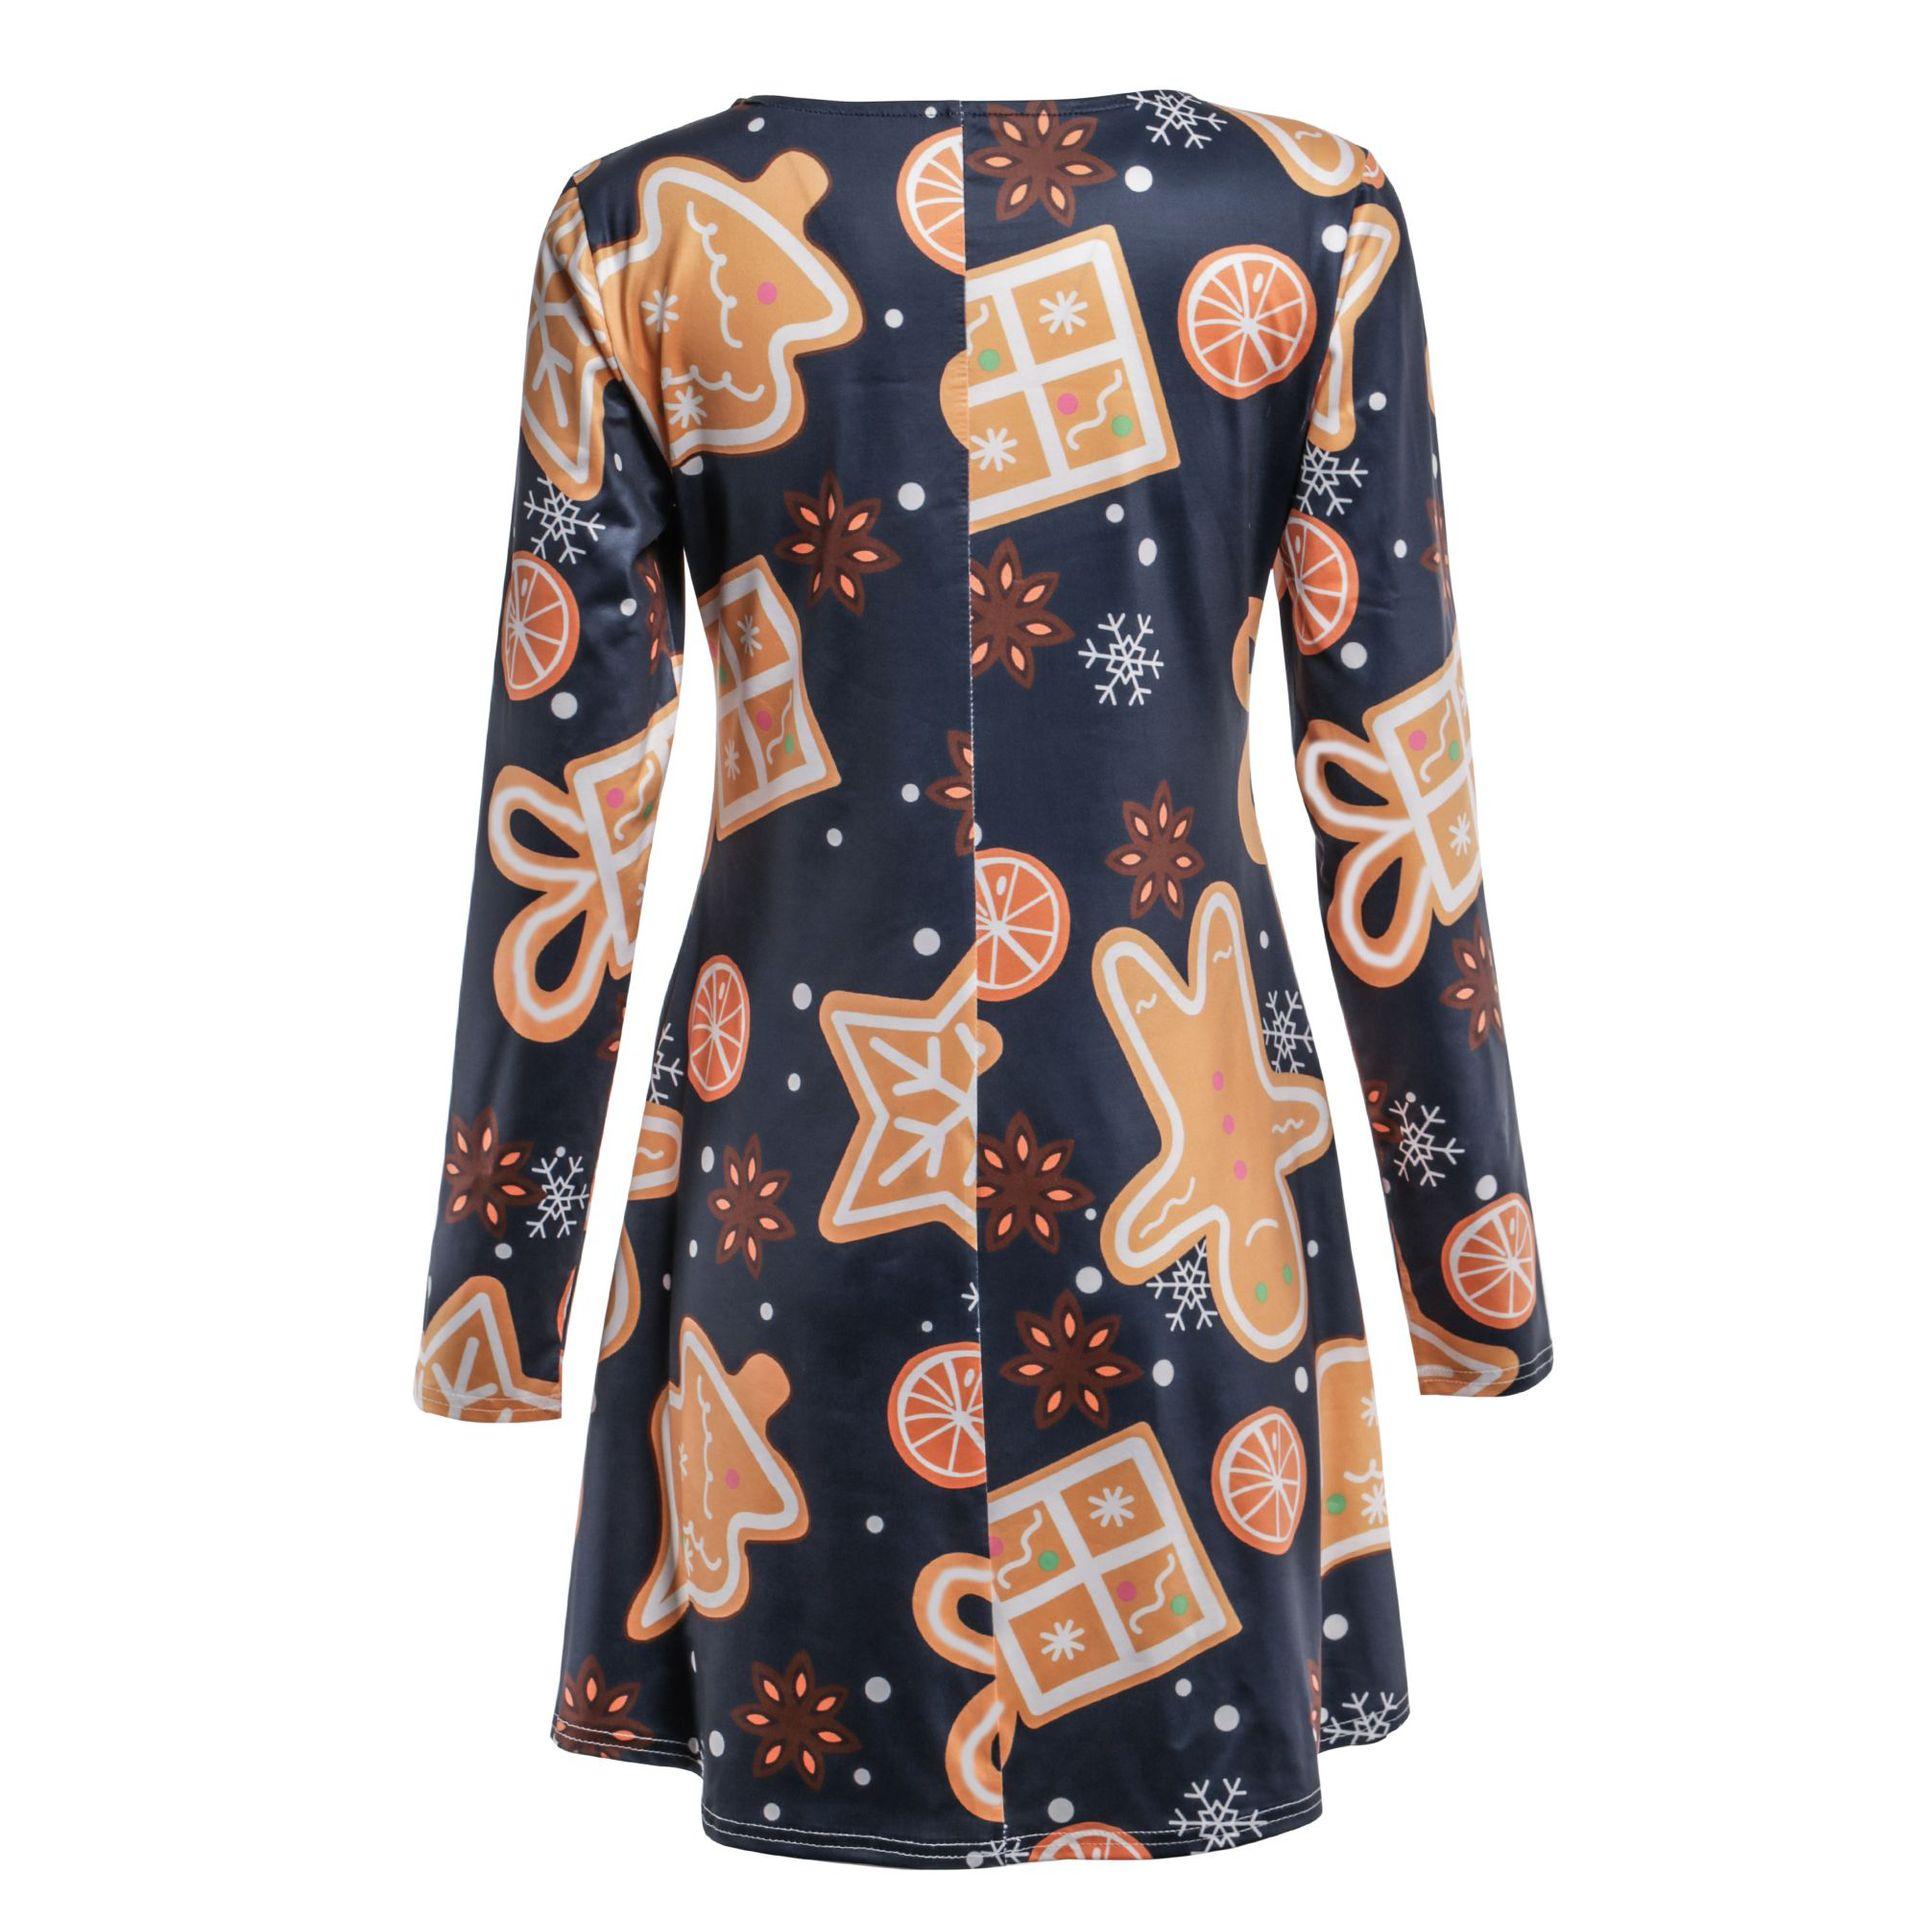 Print Long Sleeve Autumn Winter Christmas Dress Women 19 Casual Loose Short Party Dress Plus Size S-5XL Vestidos 14